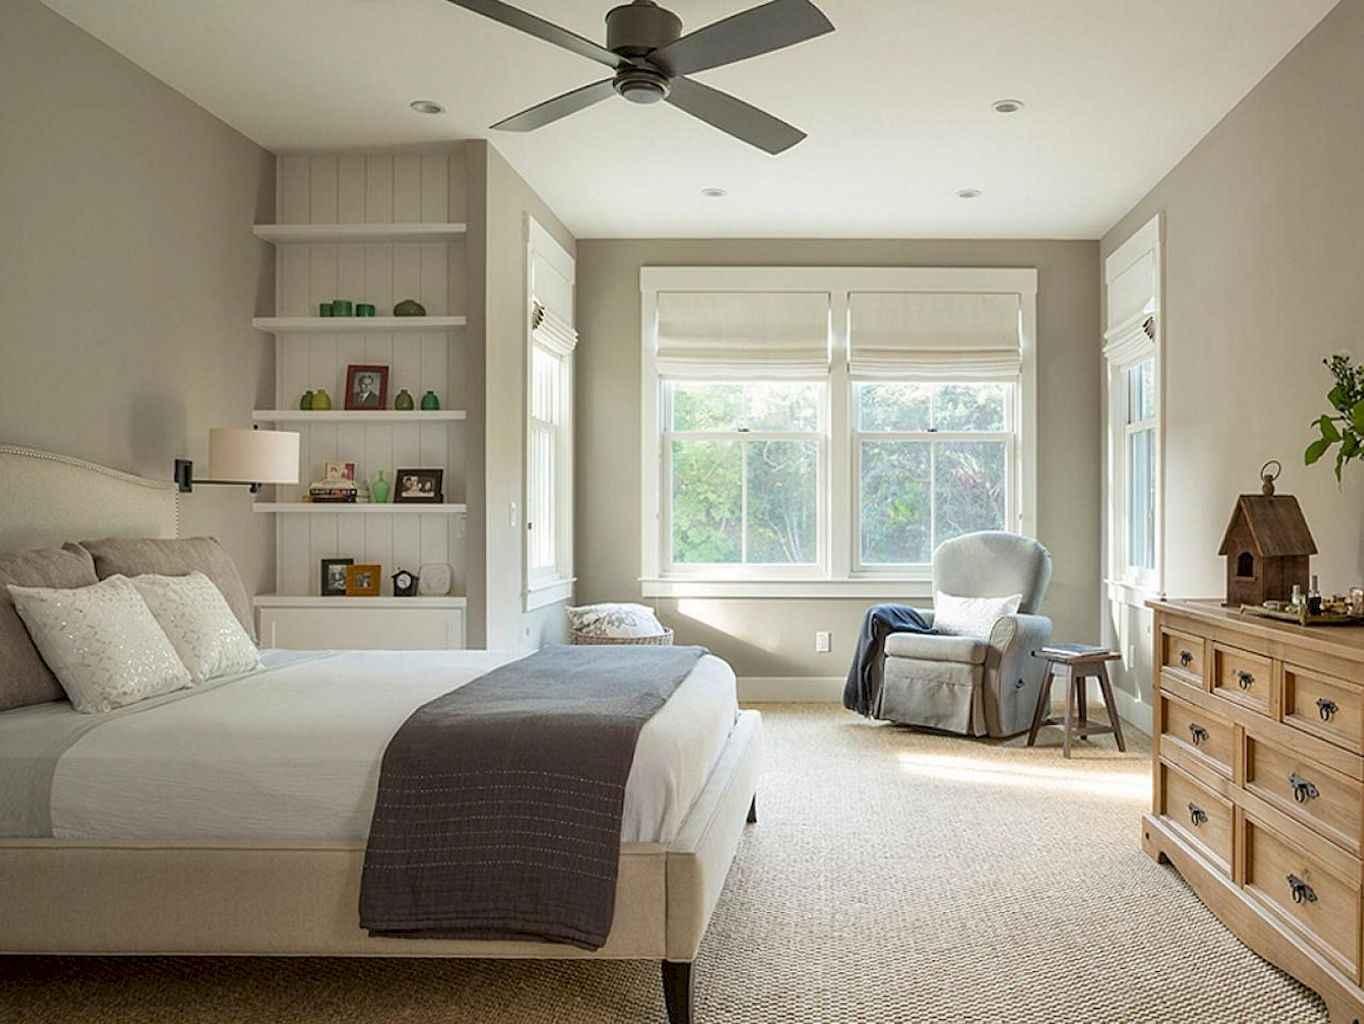 100 Stunning Farmhouse Master Bedroom Decor Ideas (62)